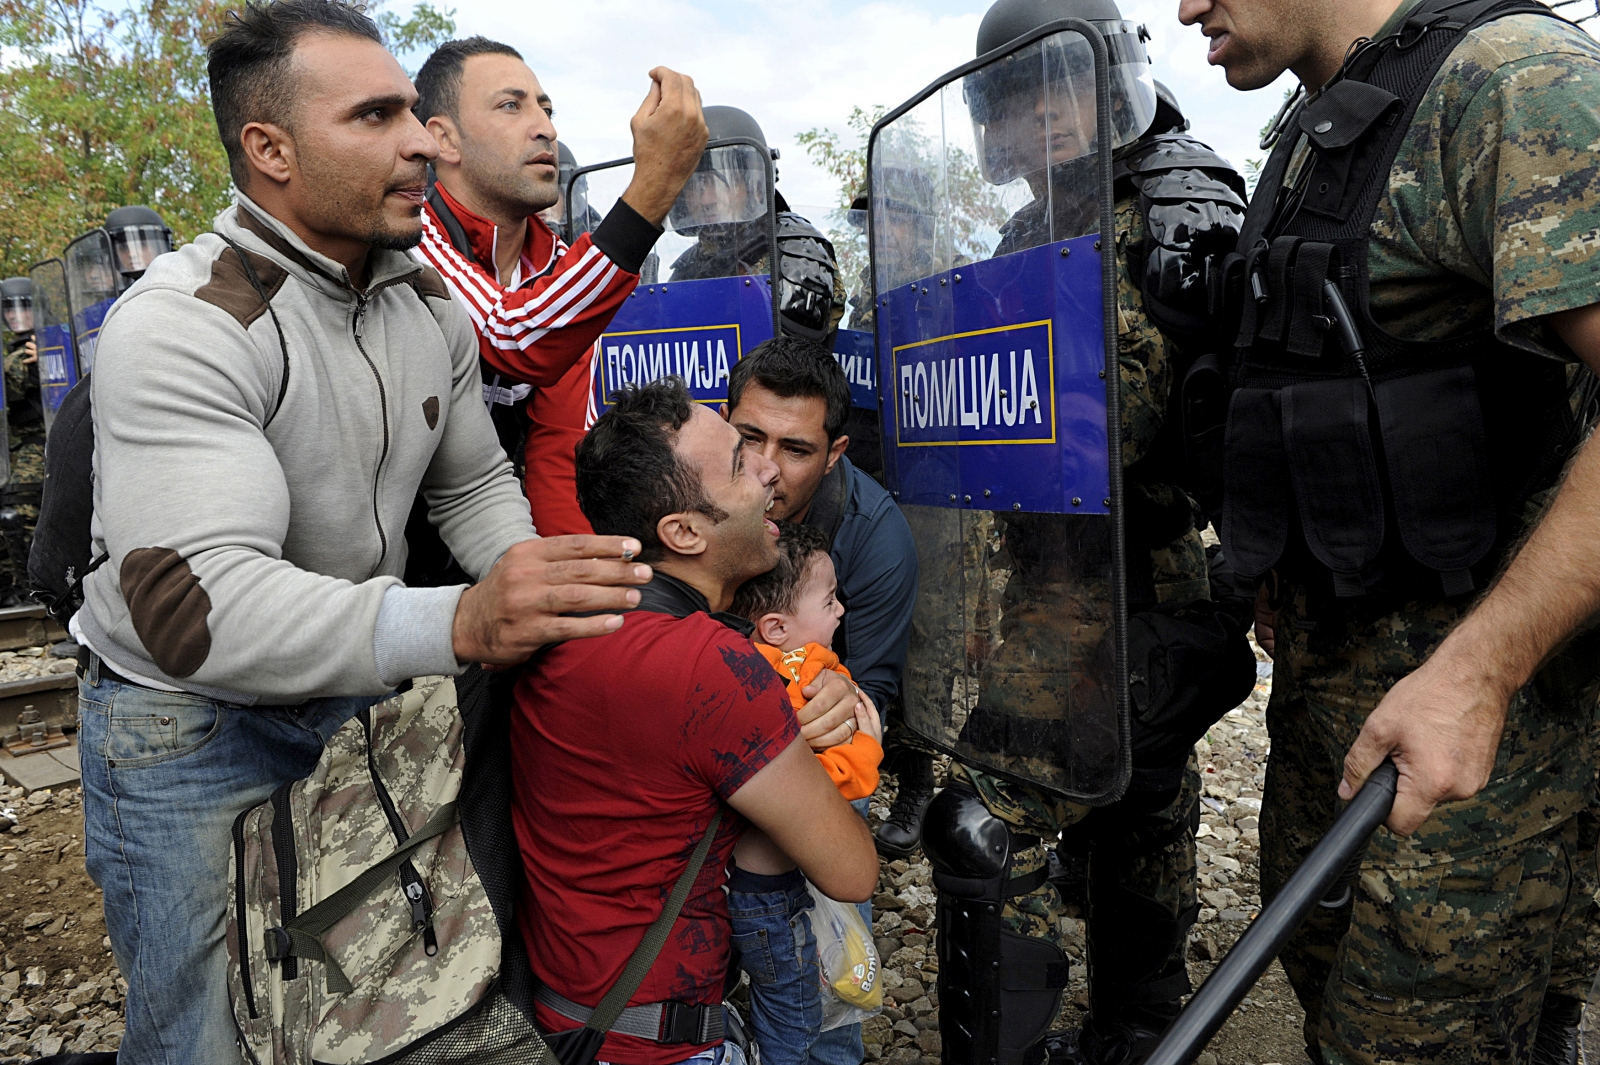 Migrants clash with border police